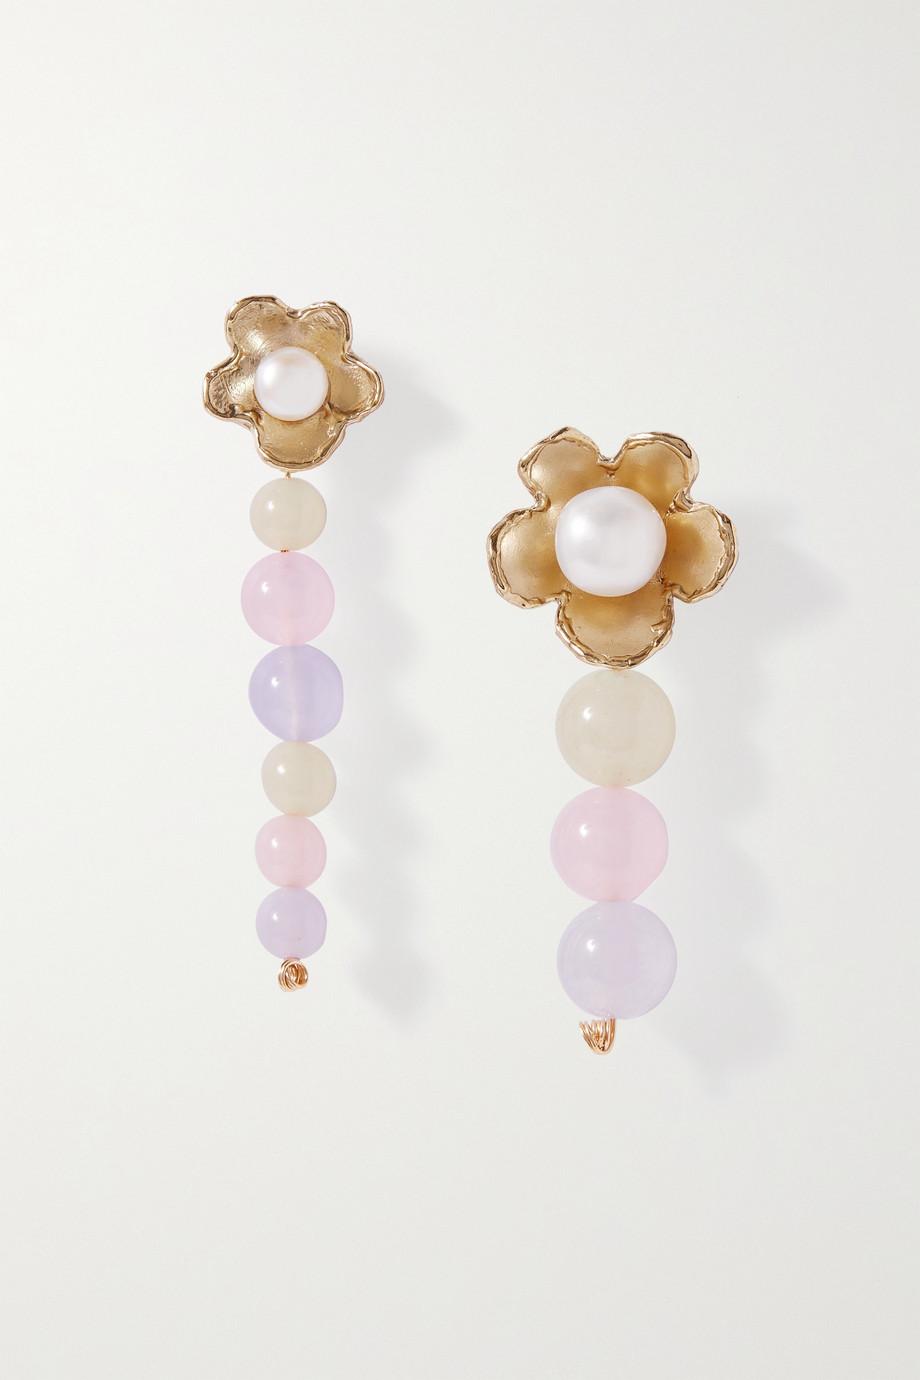 Anita Berisha Boucles d'oreilles en plaqué or, jades et perles Pastel Daisies